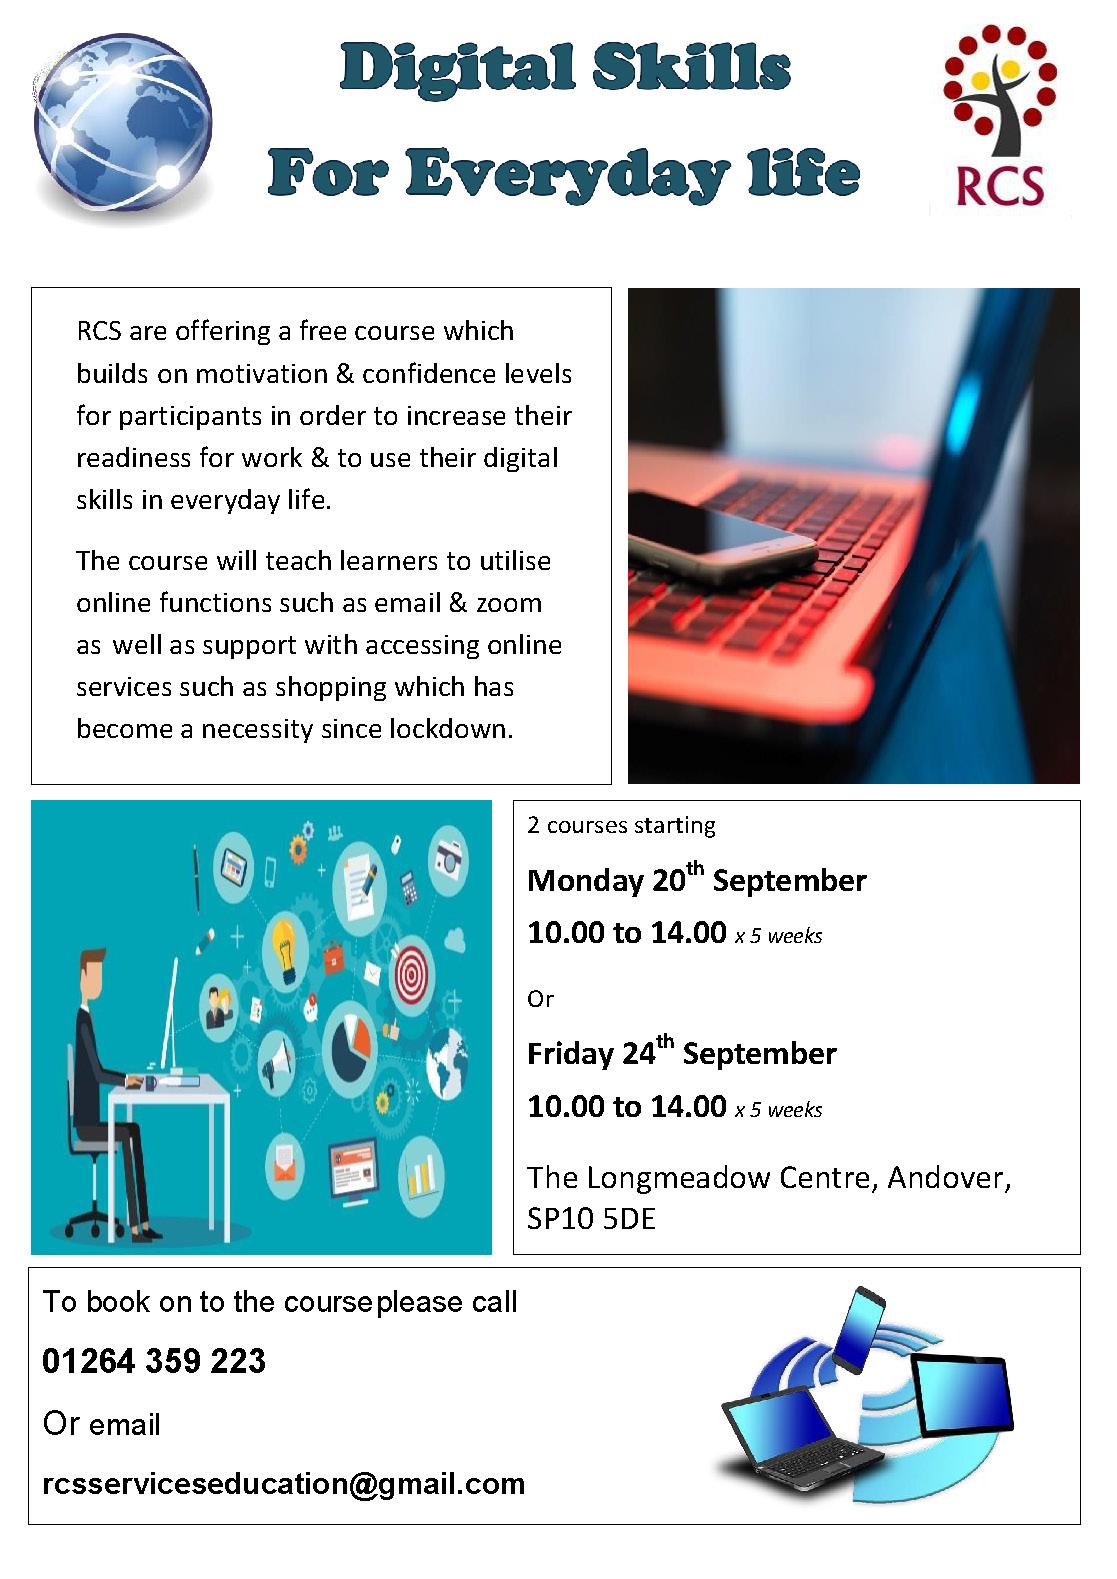 Digital Skills for Everyday Life